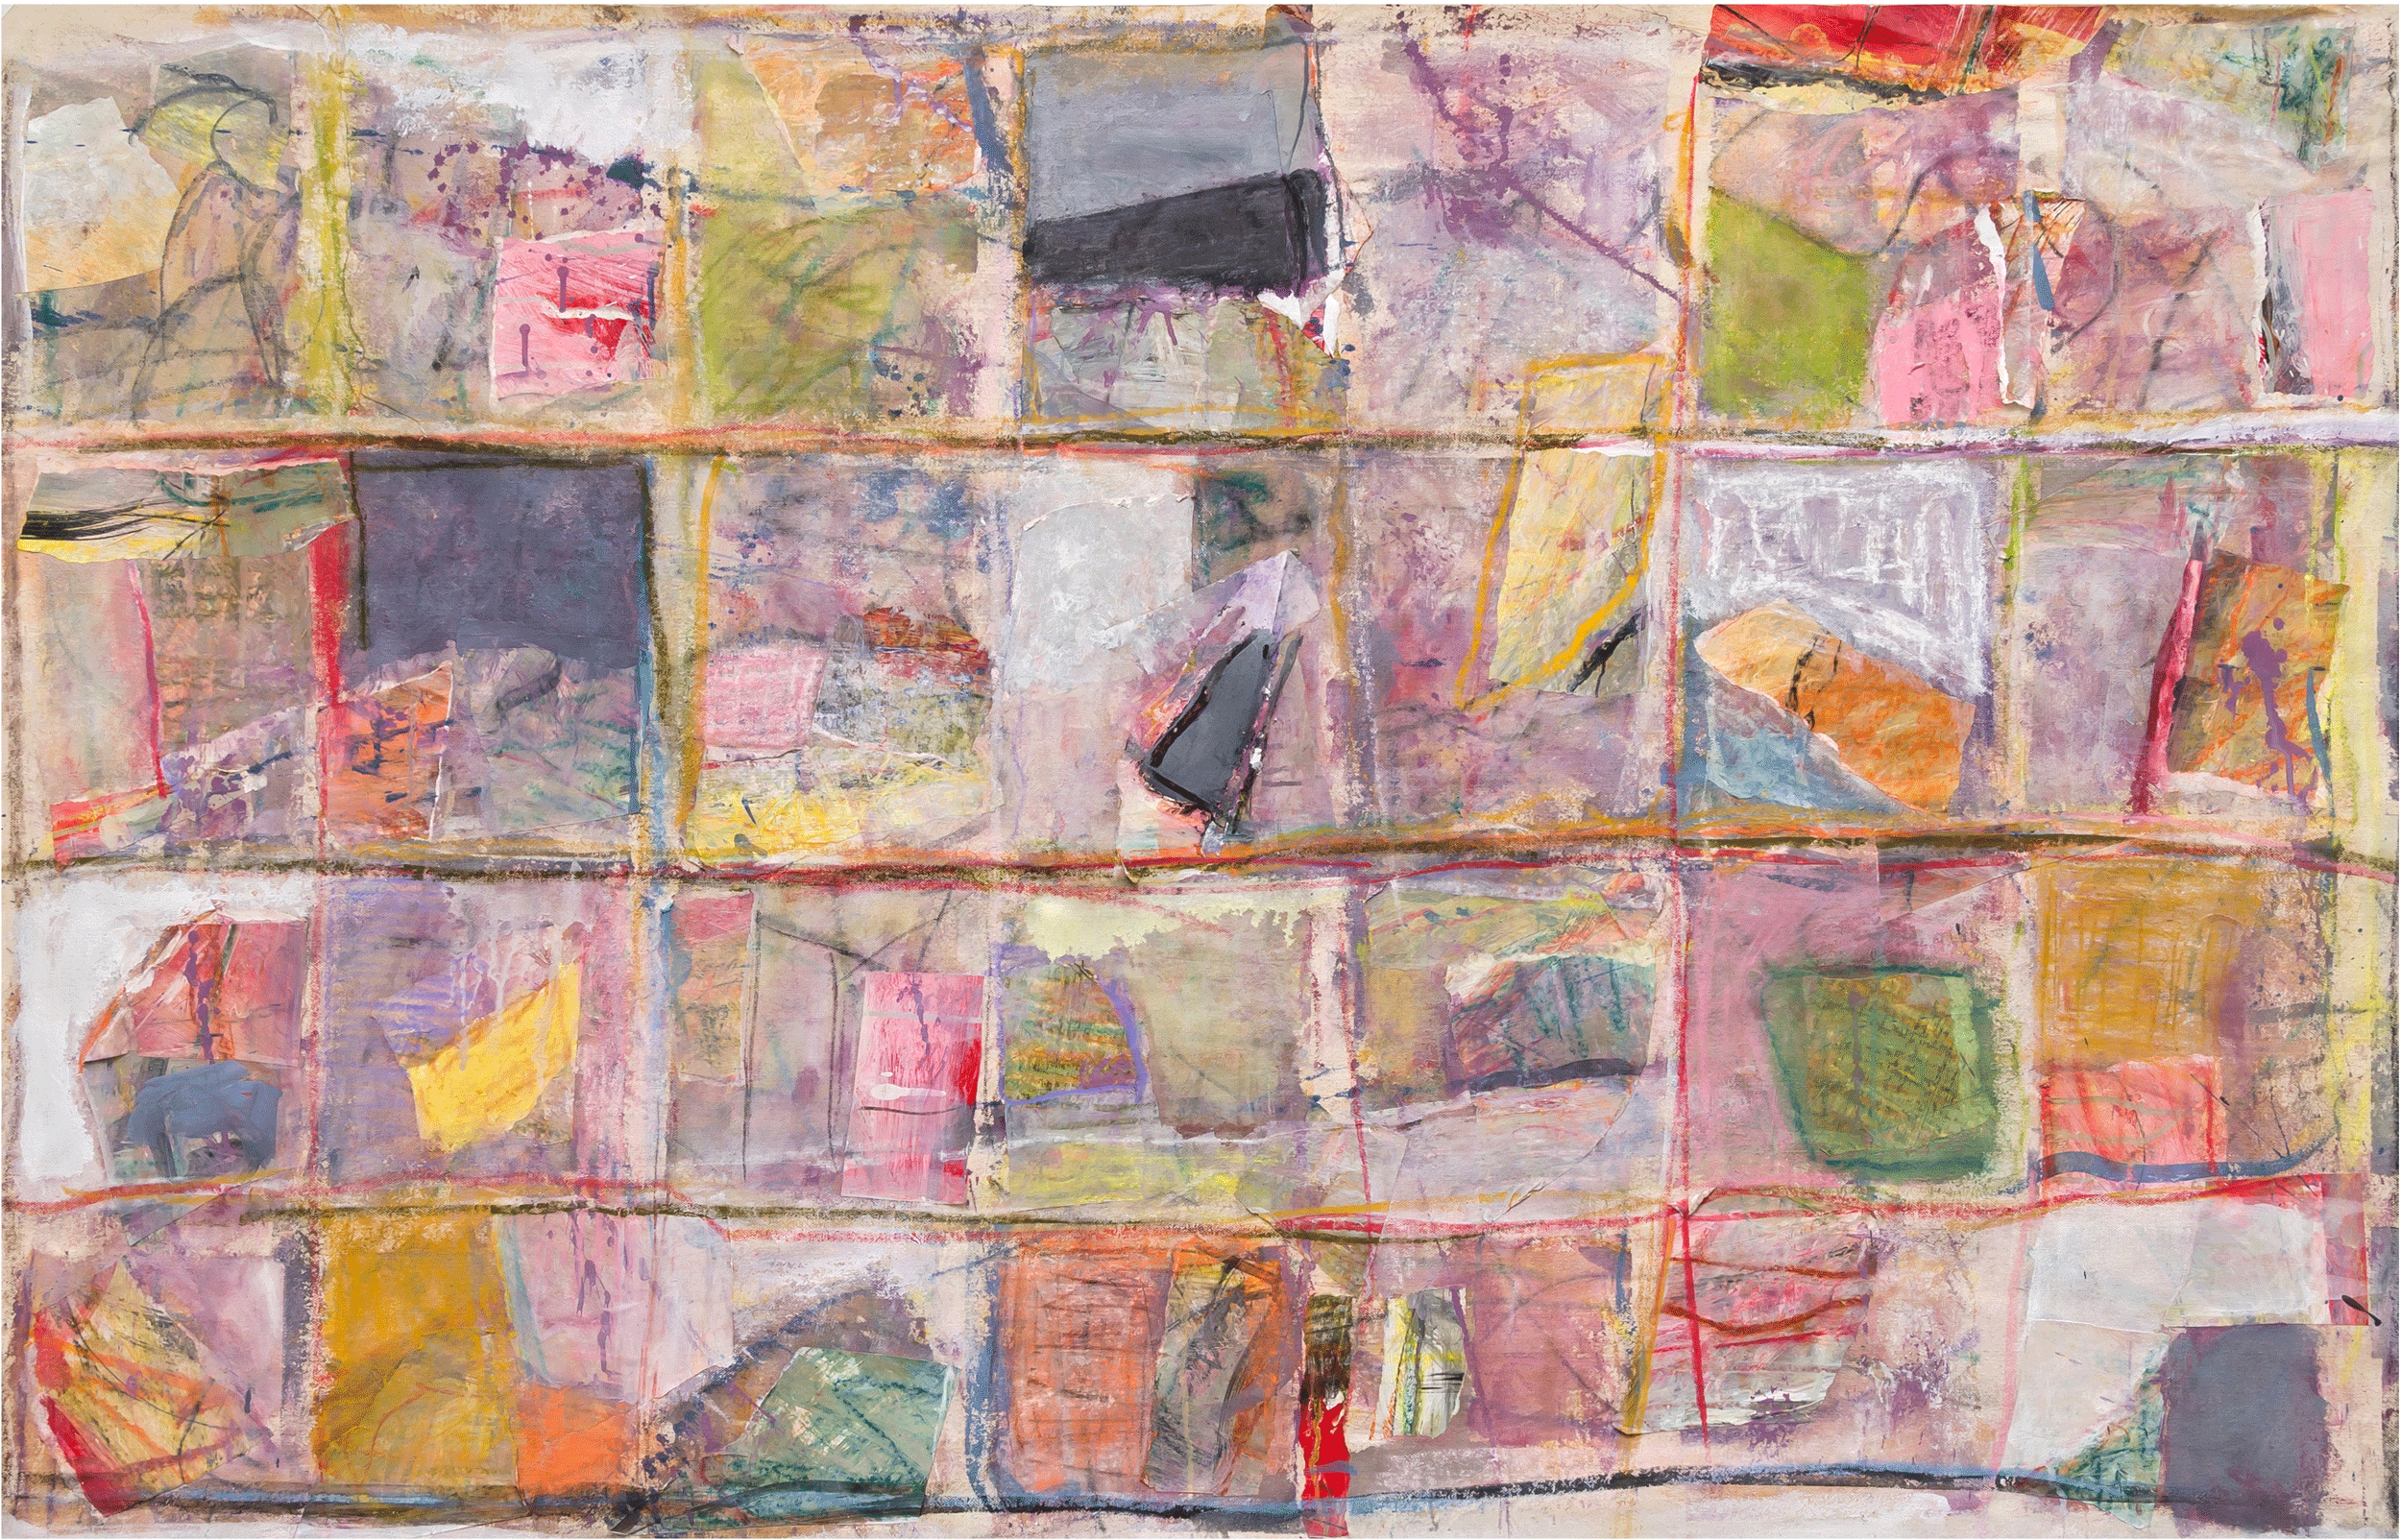 susan-levin-art-untitled-2.png